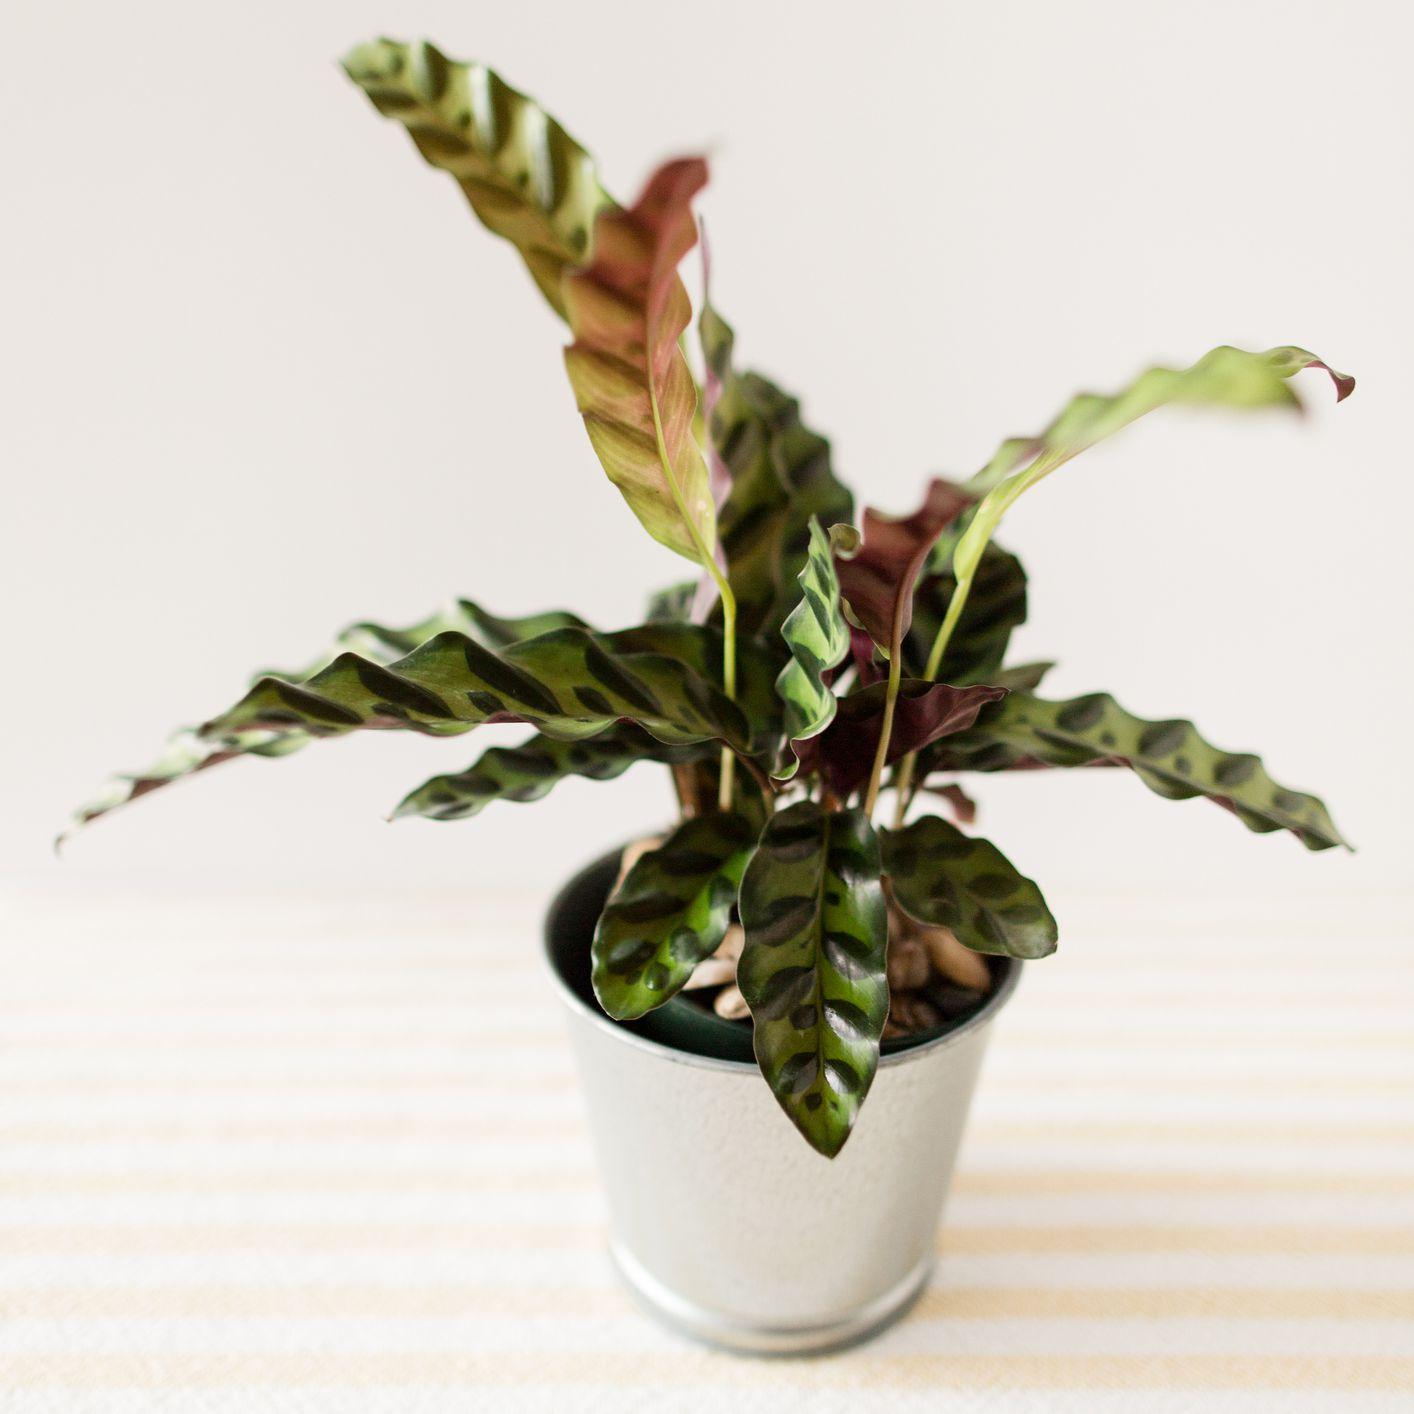 Rattlesnake plant in a metal pot